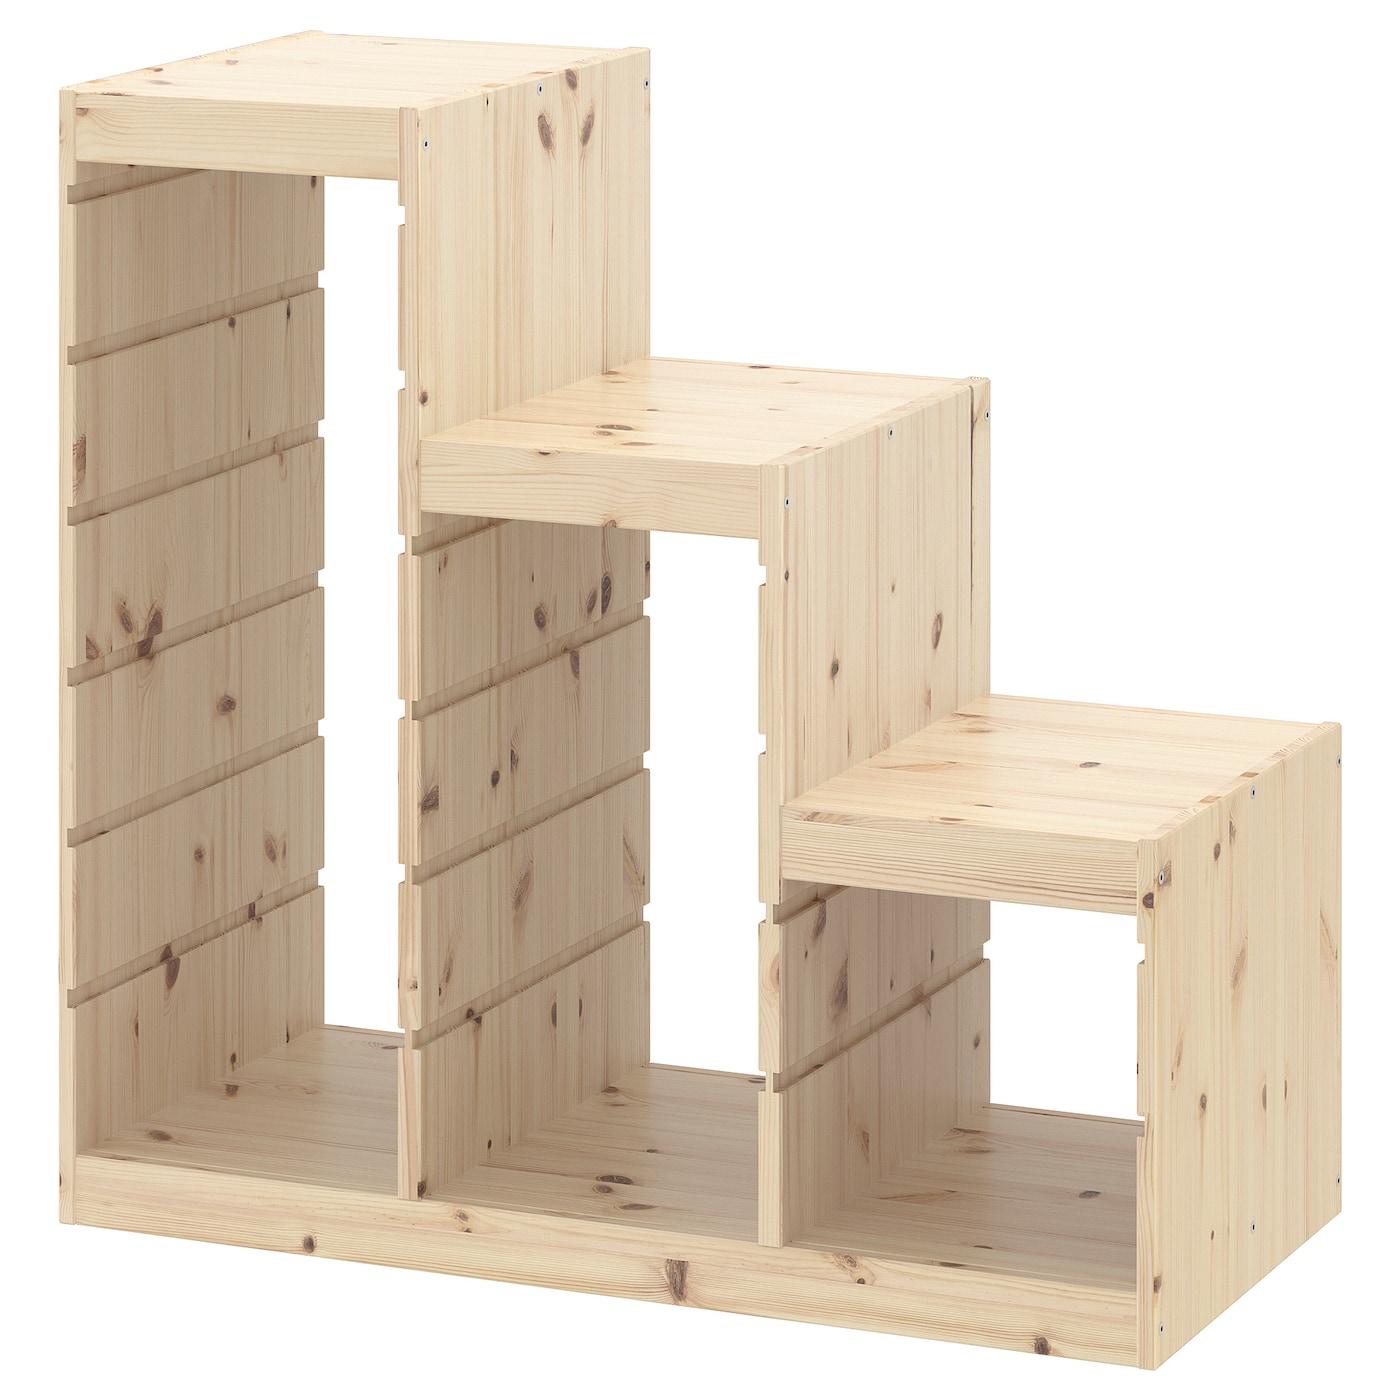 Trofast Regalrahmen Kiefer Weiss Gebeizt Hell Kiefer Ikea